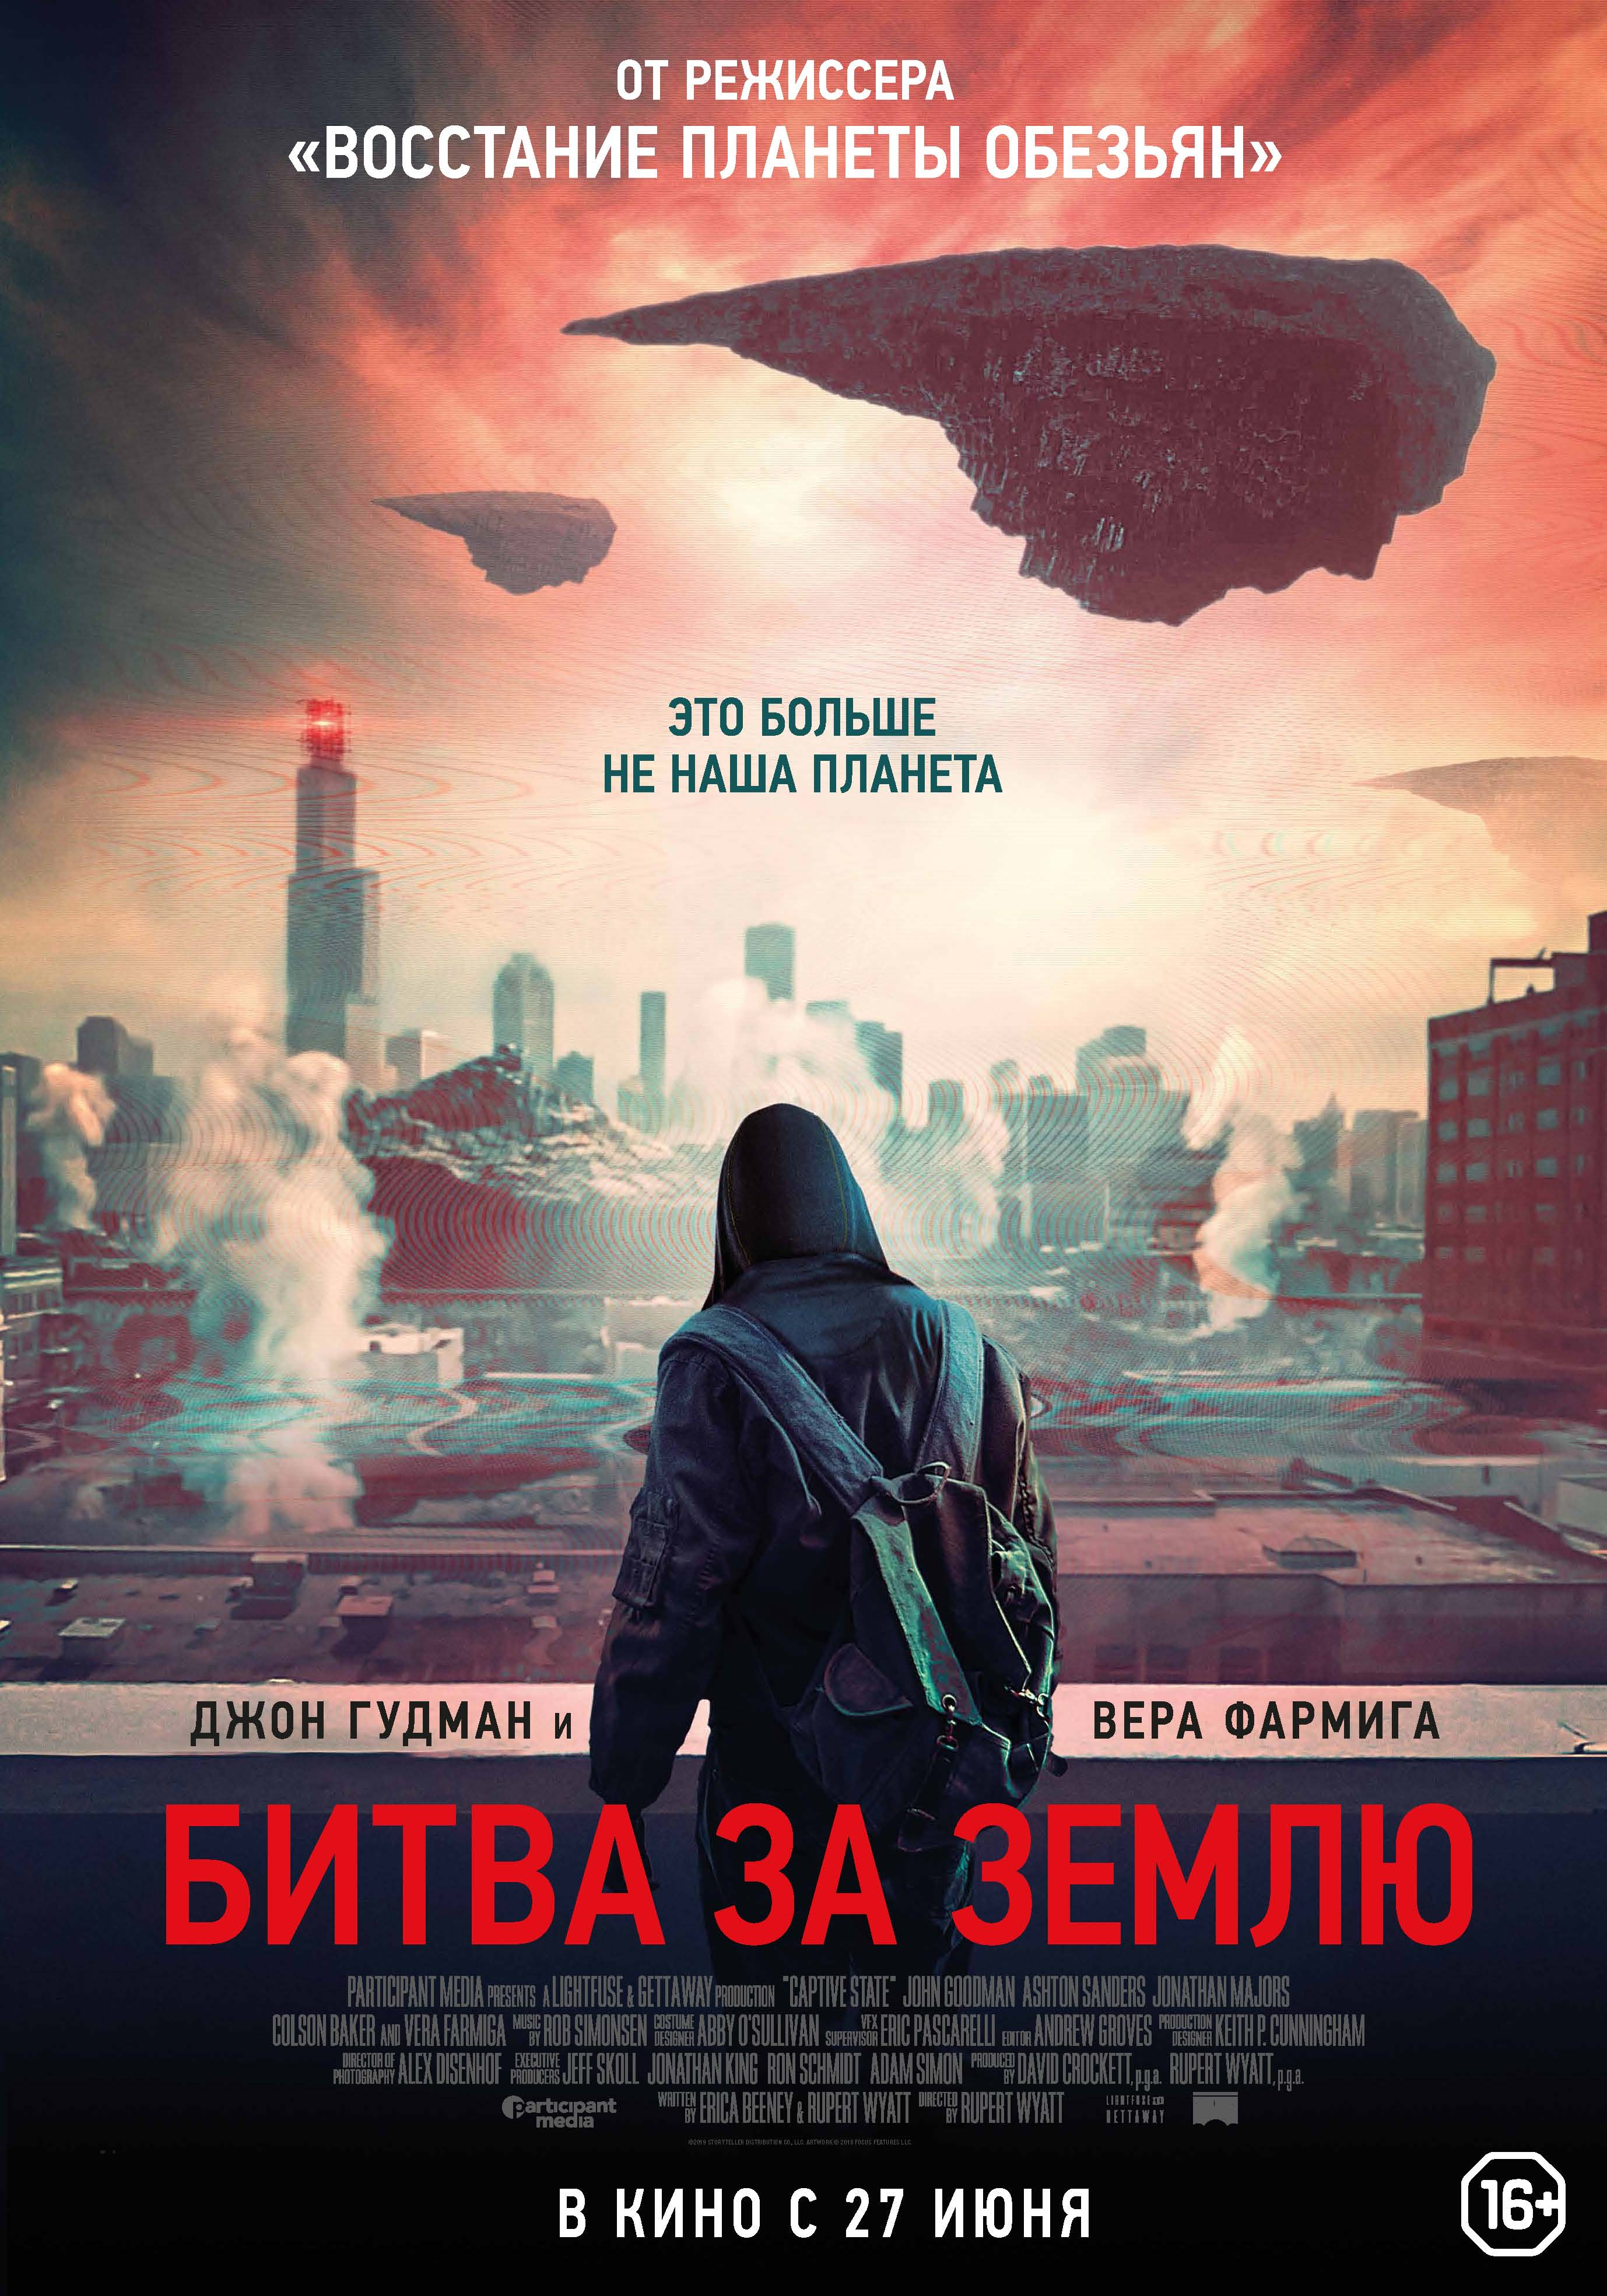 Битва за Землю / Captive State (2019) BDRip-HEVC 1080p